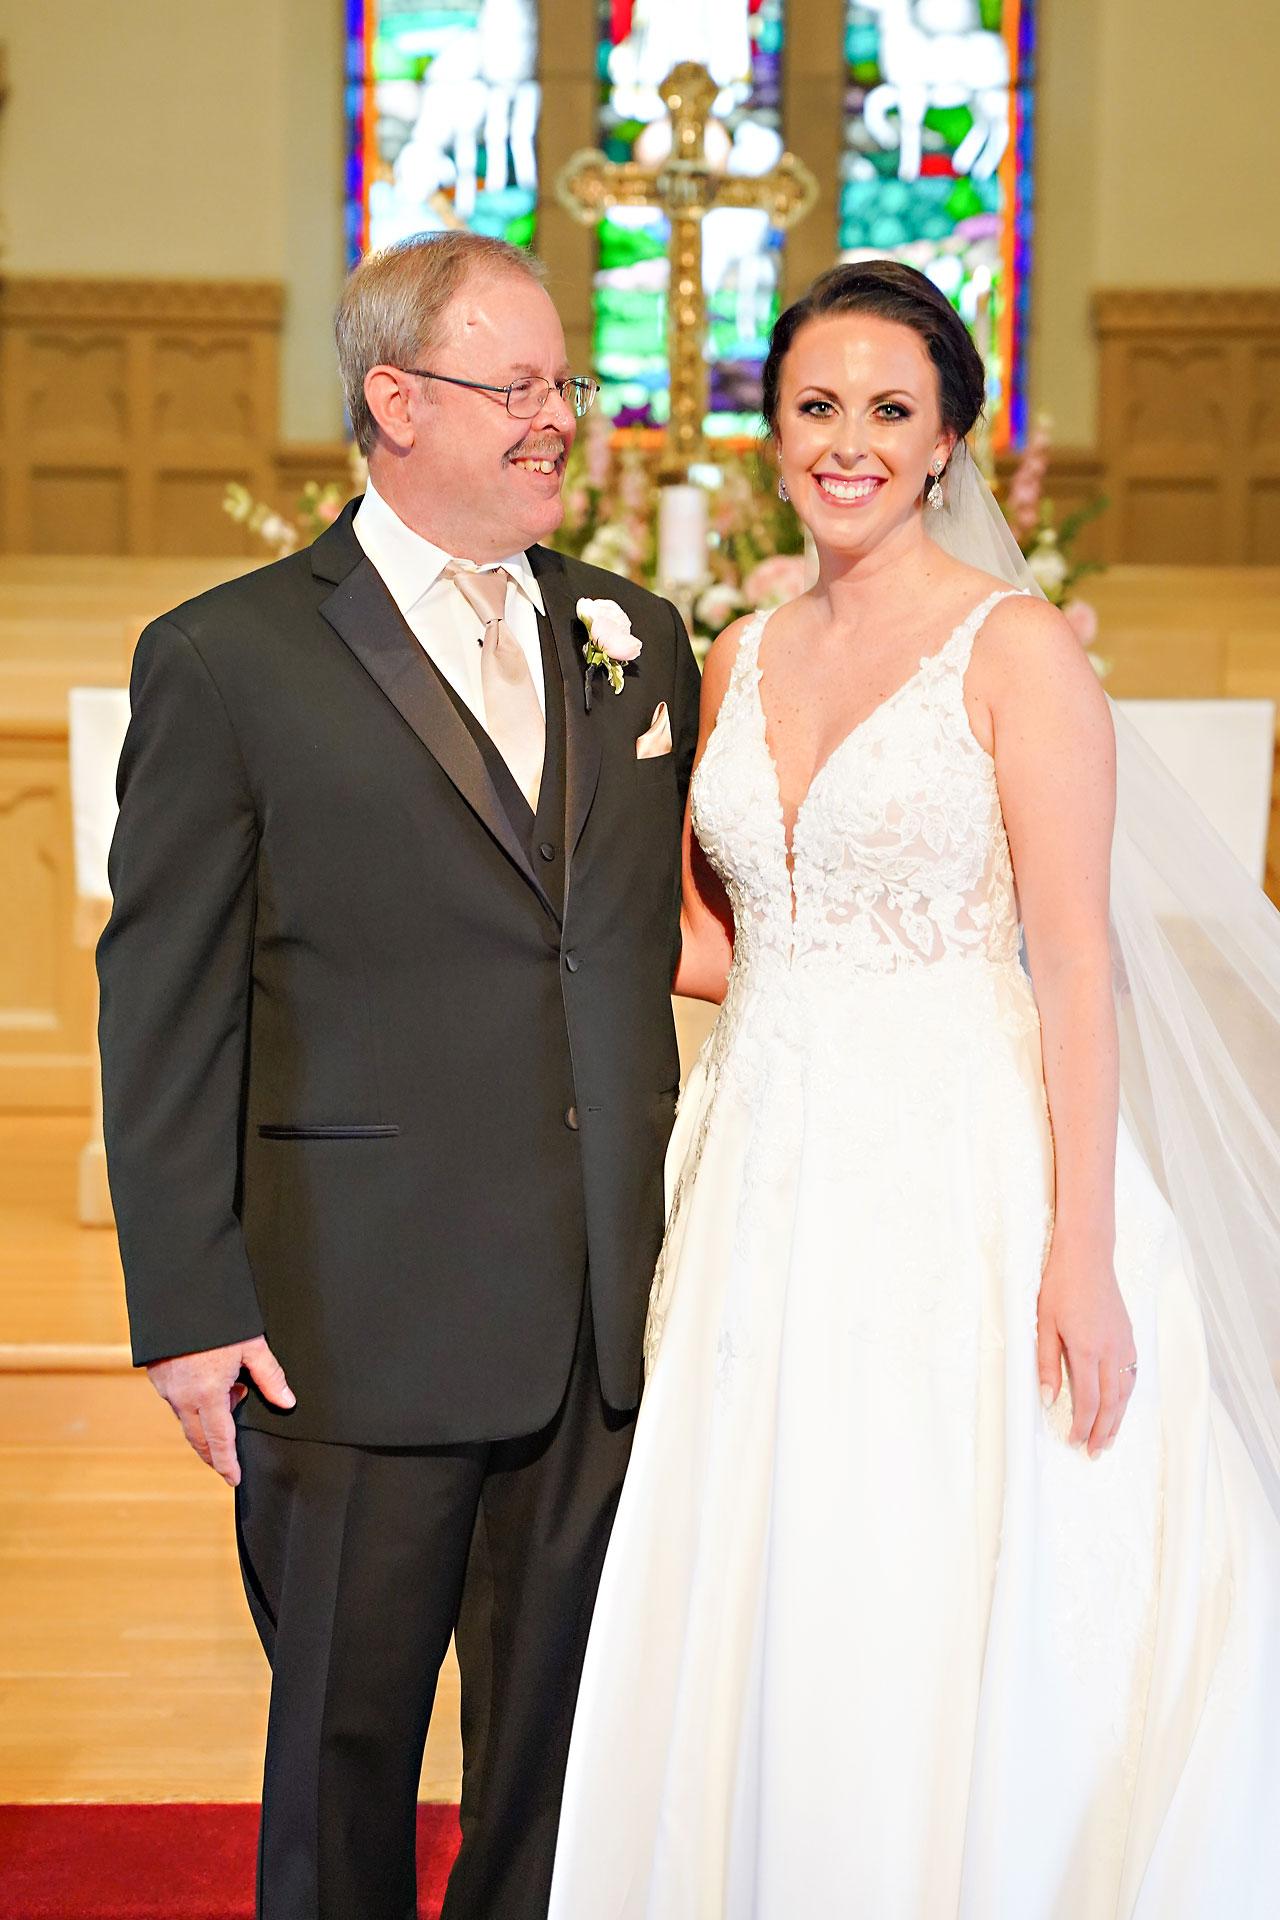 Michelle Casey Palais Royale South Bend Wedding 040